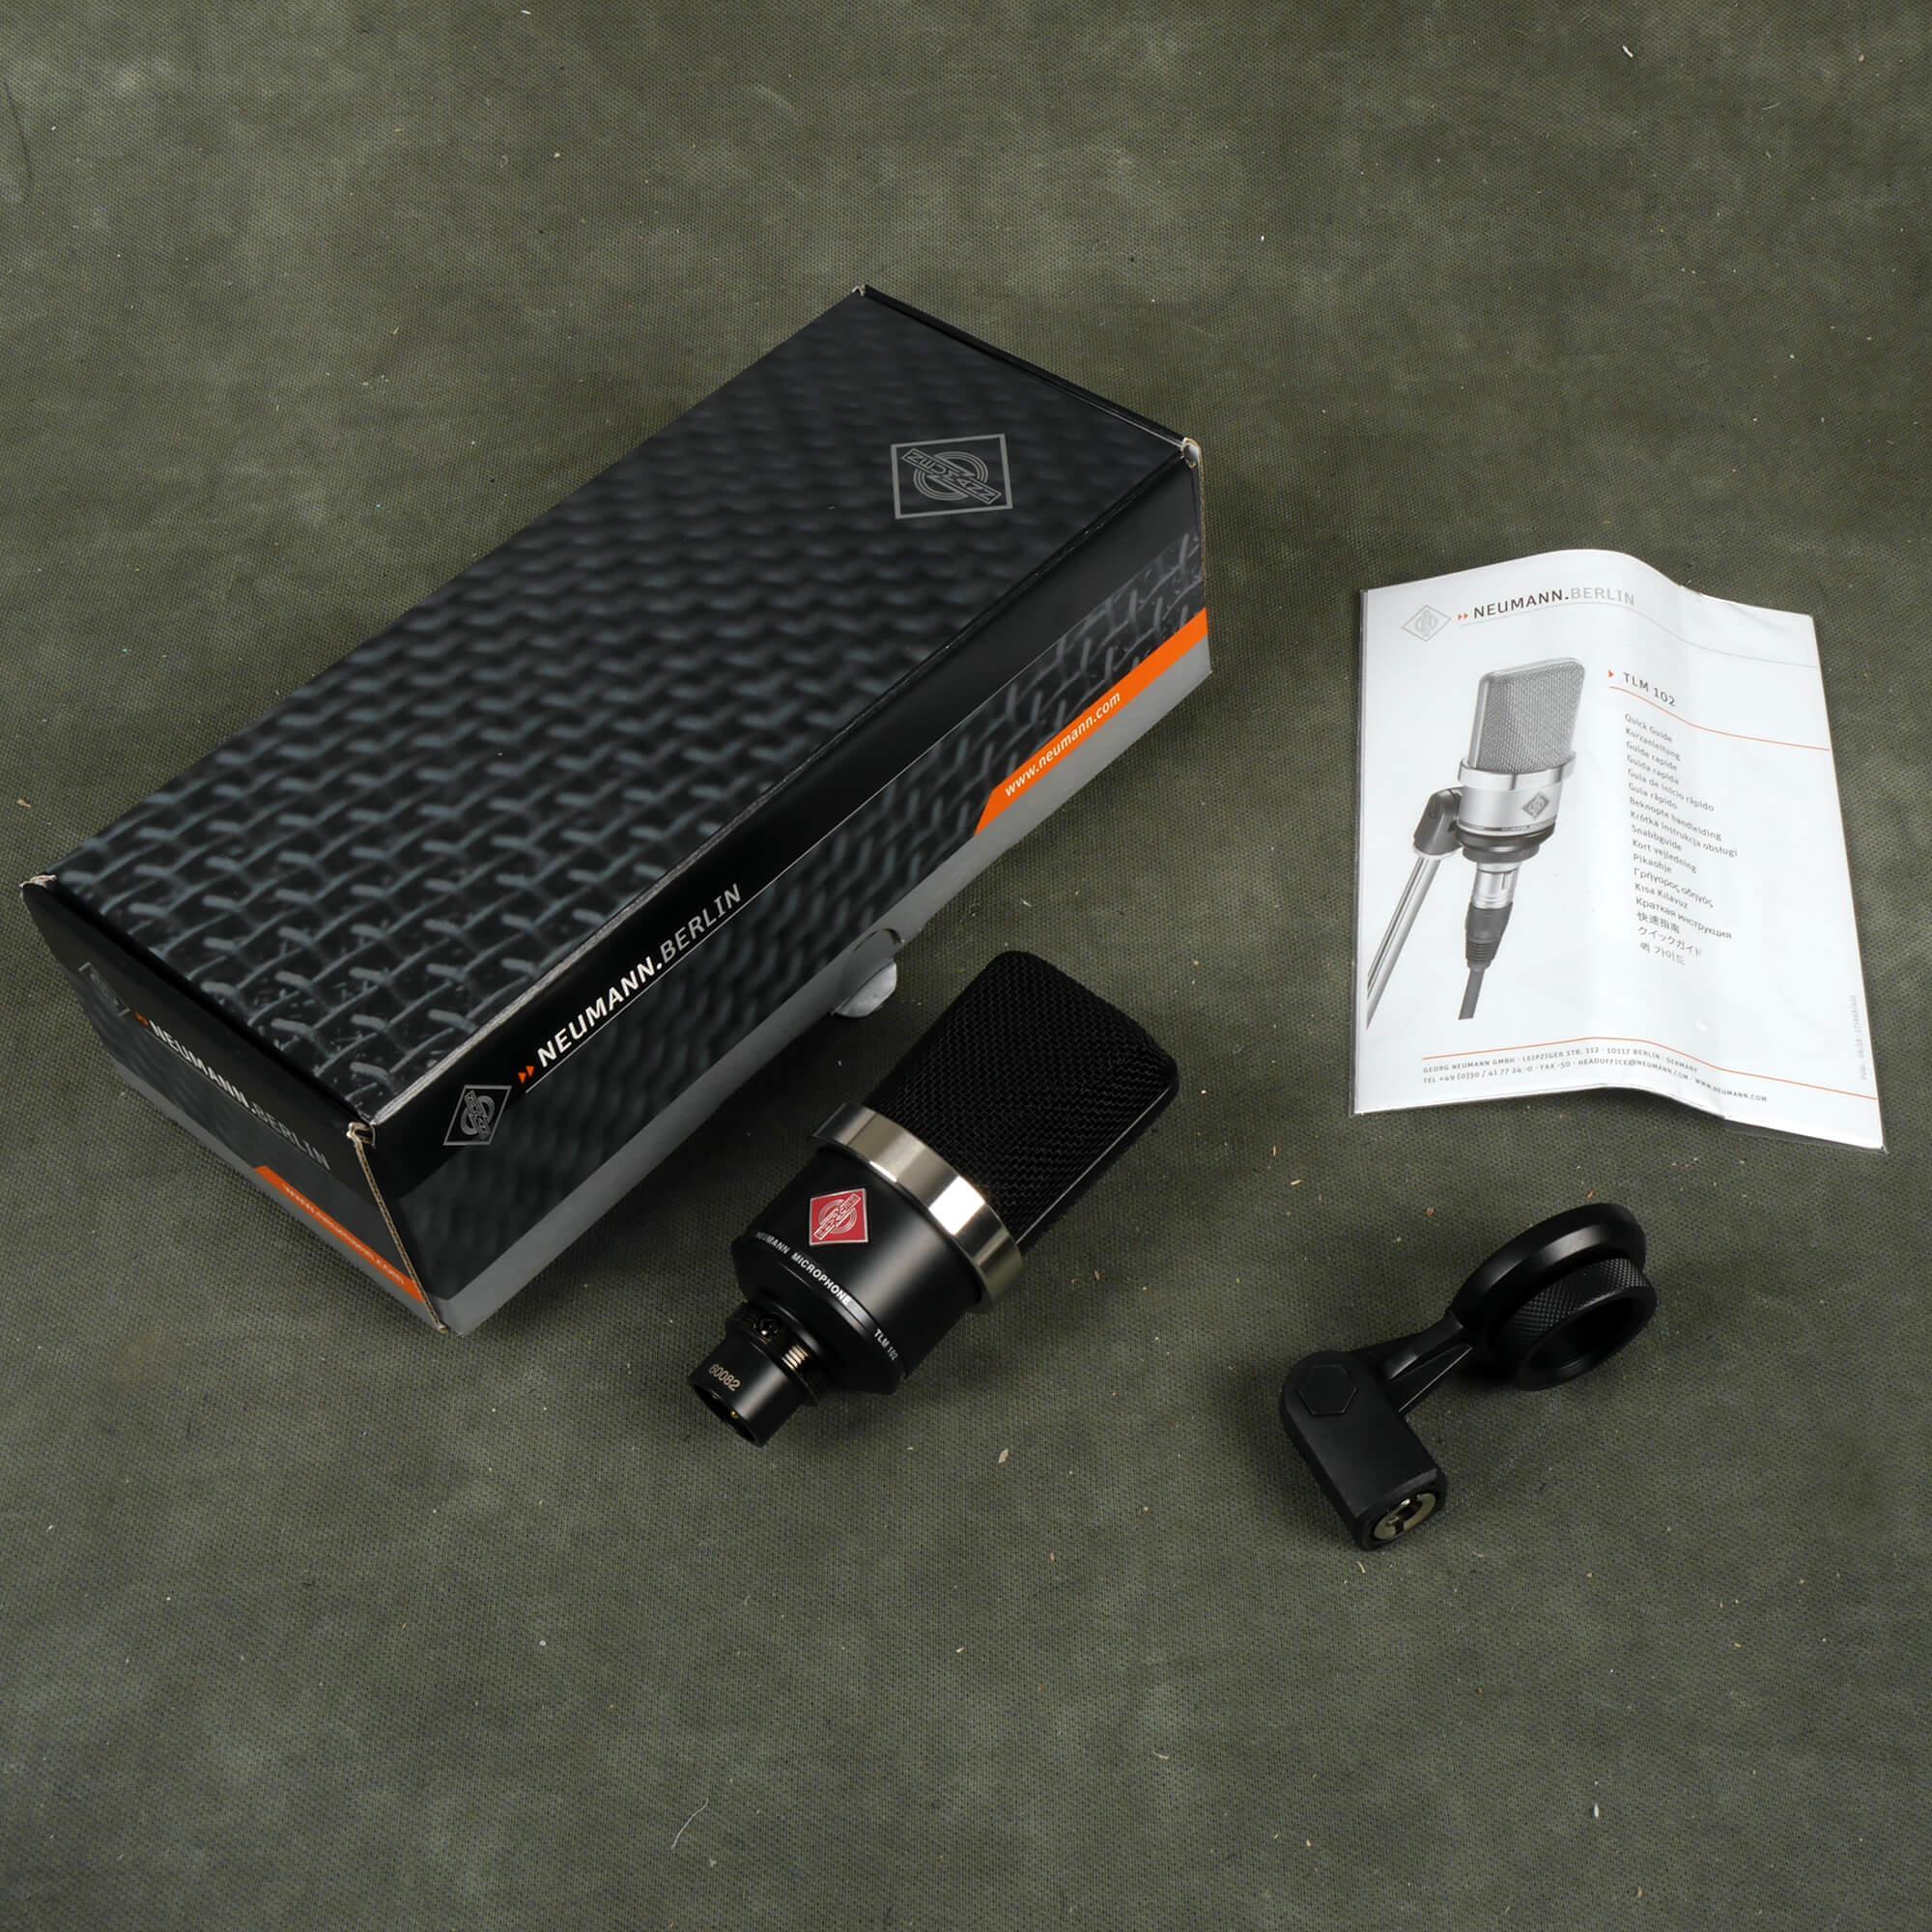 Neumann TLM102 Condenser Microphone w/Box - 2nd Hand